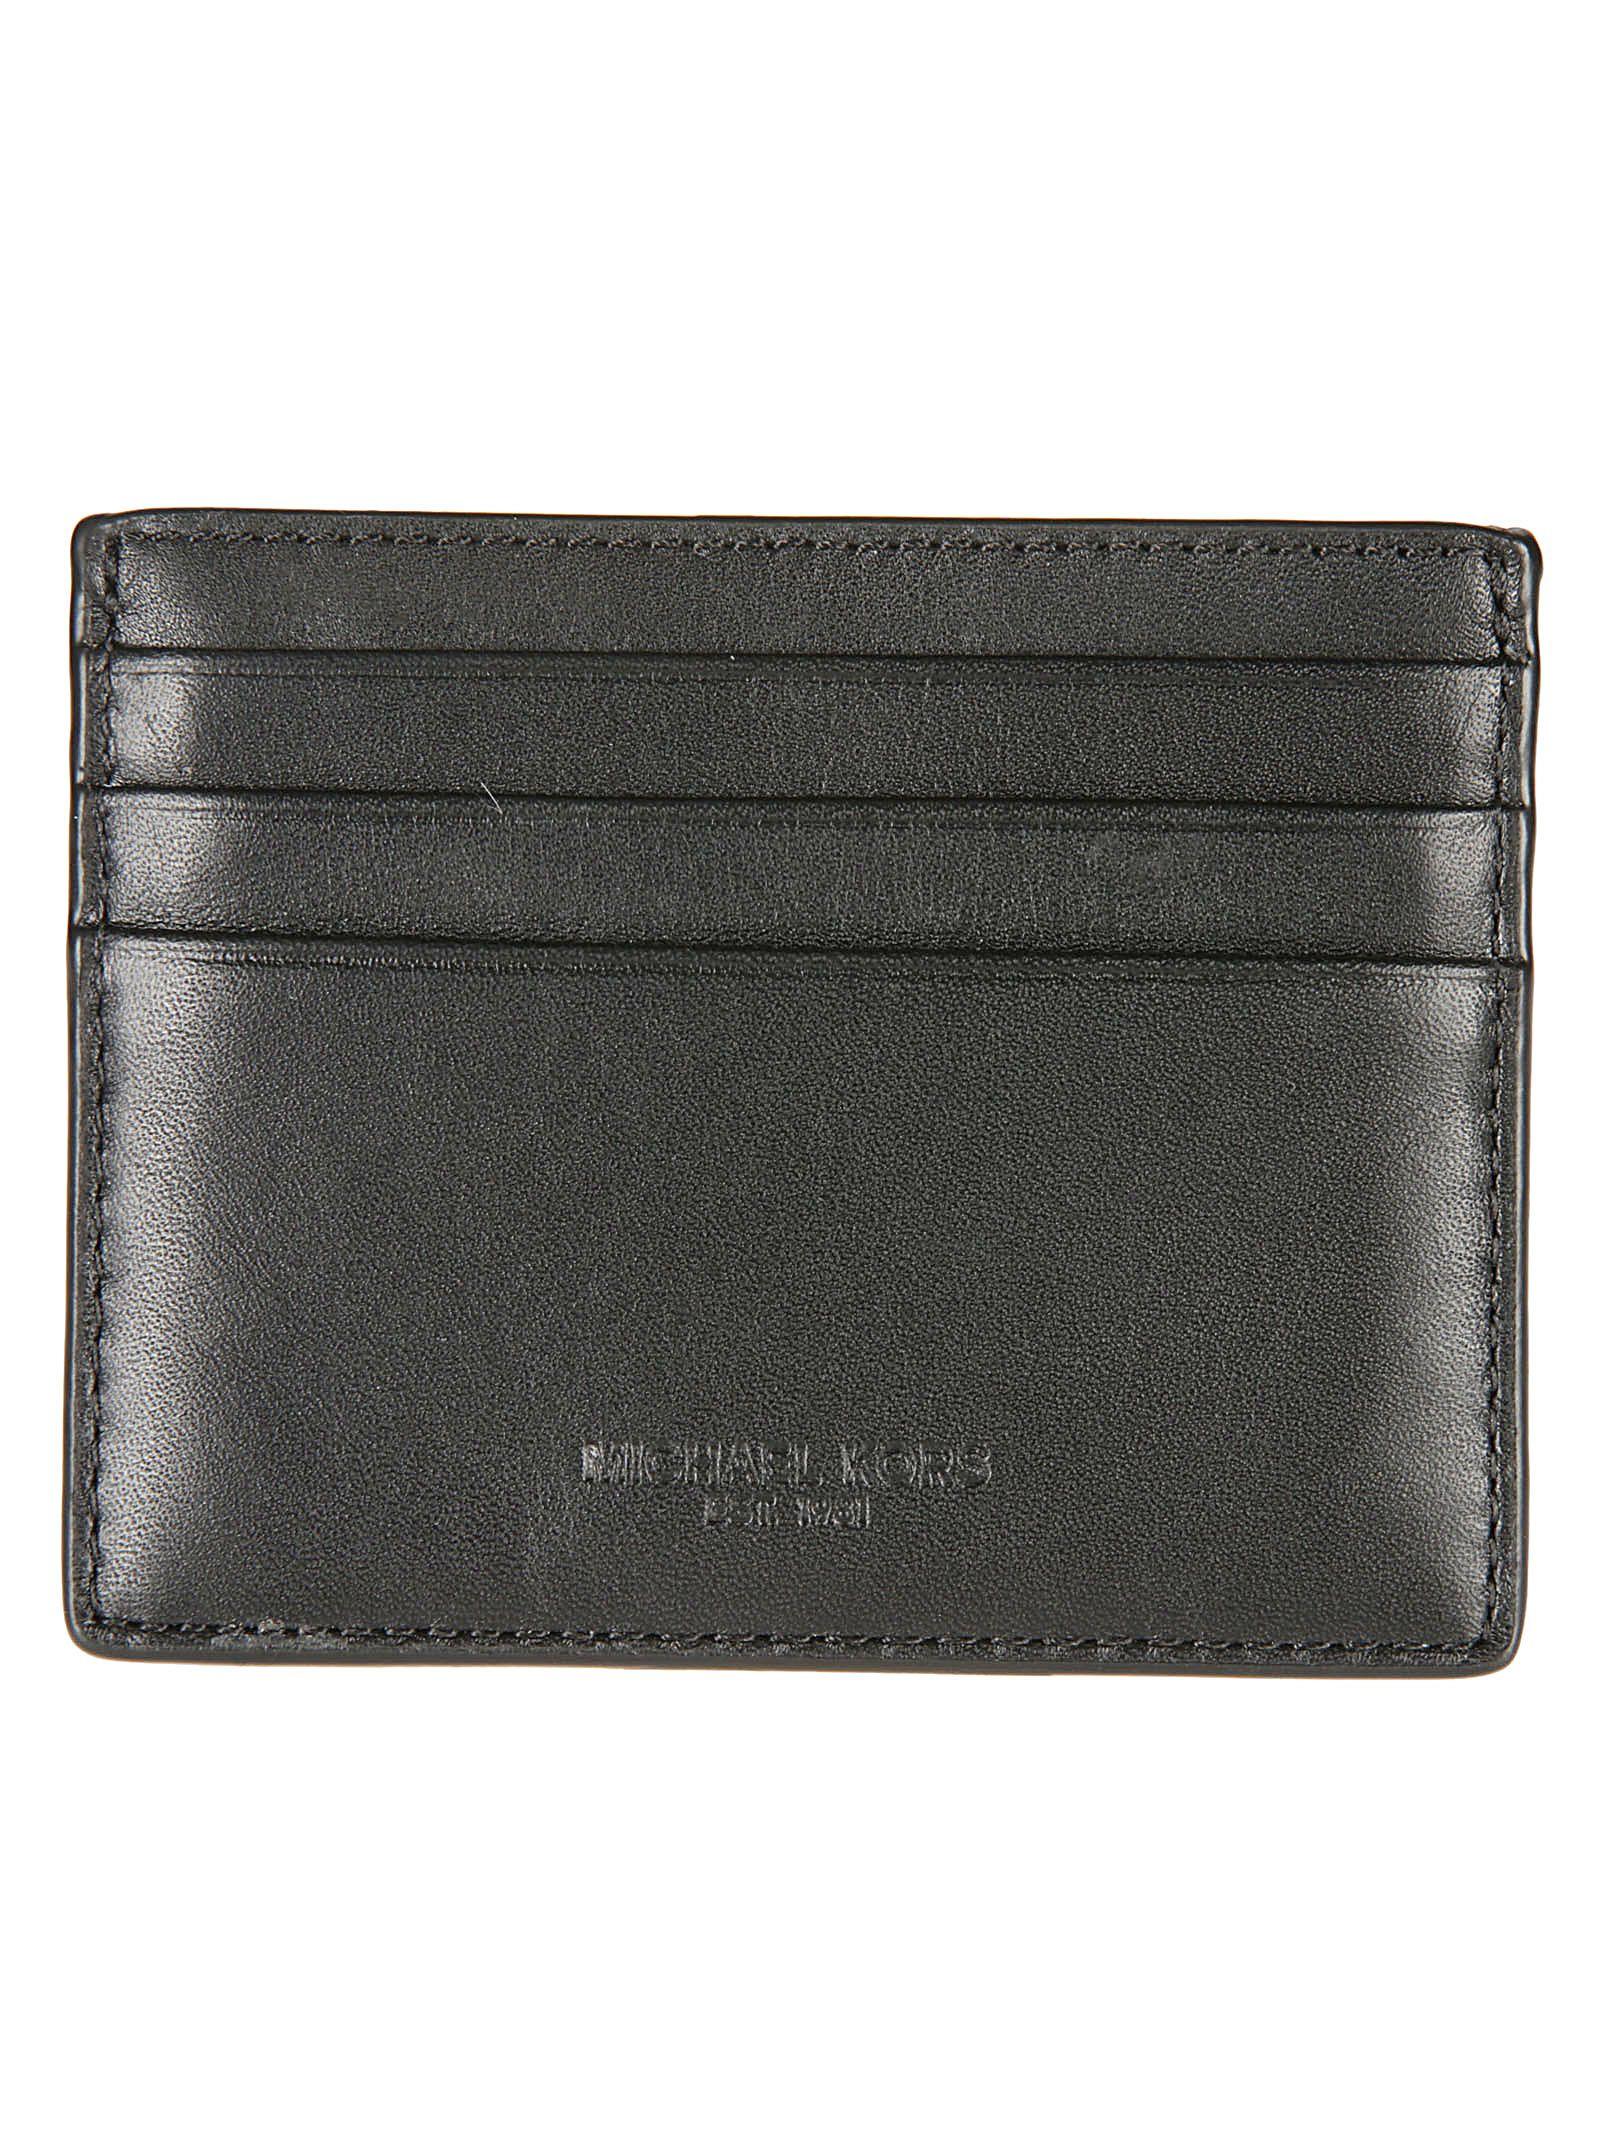 fa0ce595bb8c Michael Kors Michael Kors Odin Tall Card Holder - Black - 10746438 ...